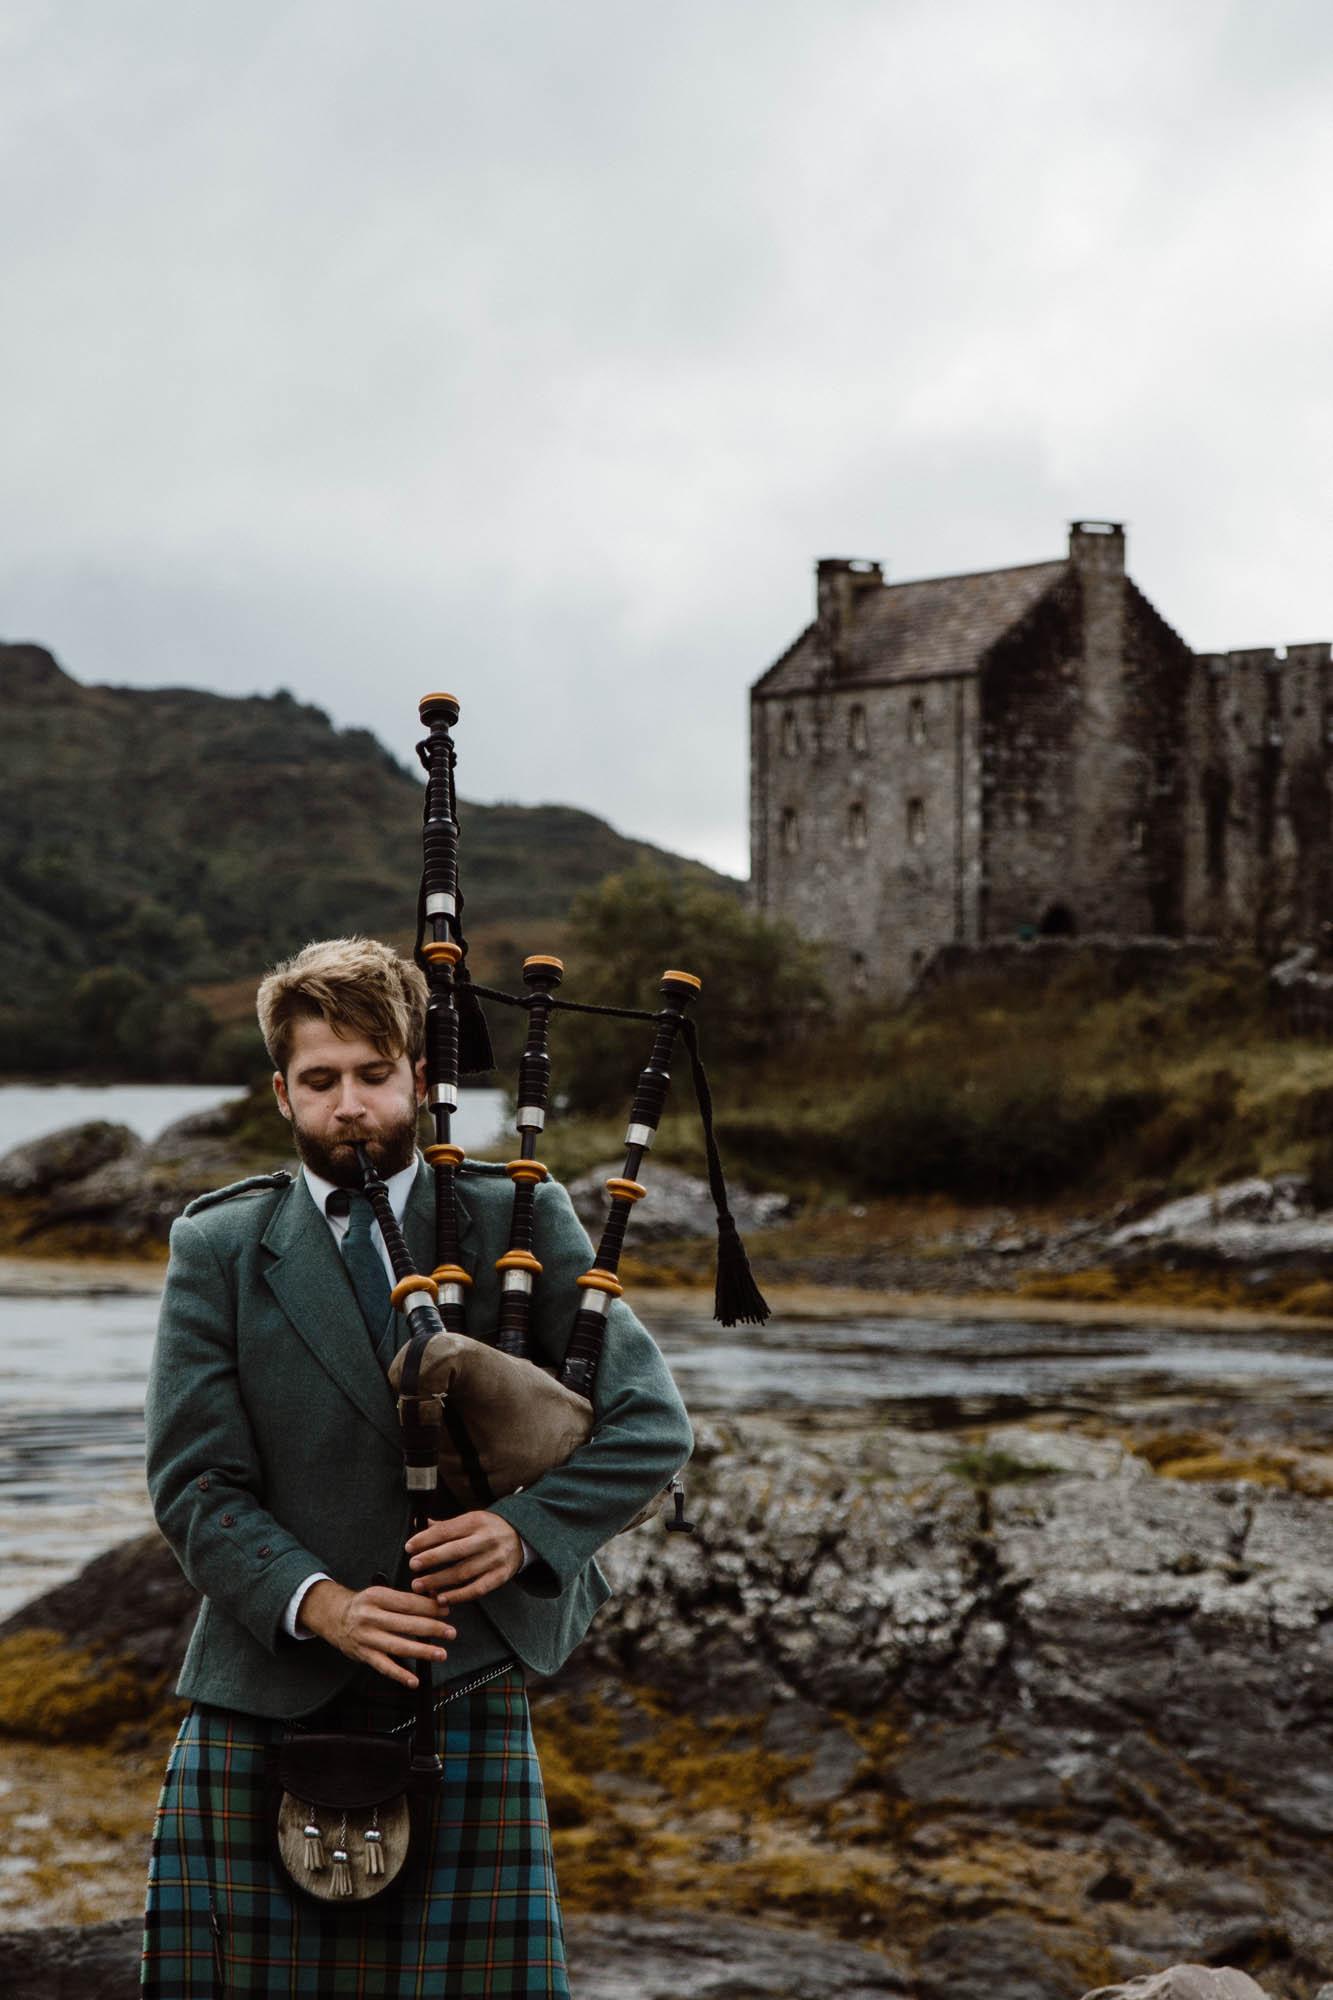 Scotland portrait photographer, Scotland Model, UK Fashion model, wedding photographer scotland, photographer edinburgh scotland, Eilean Donan Castle